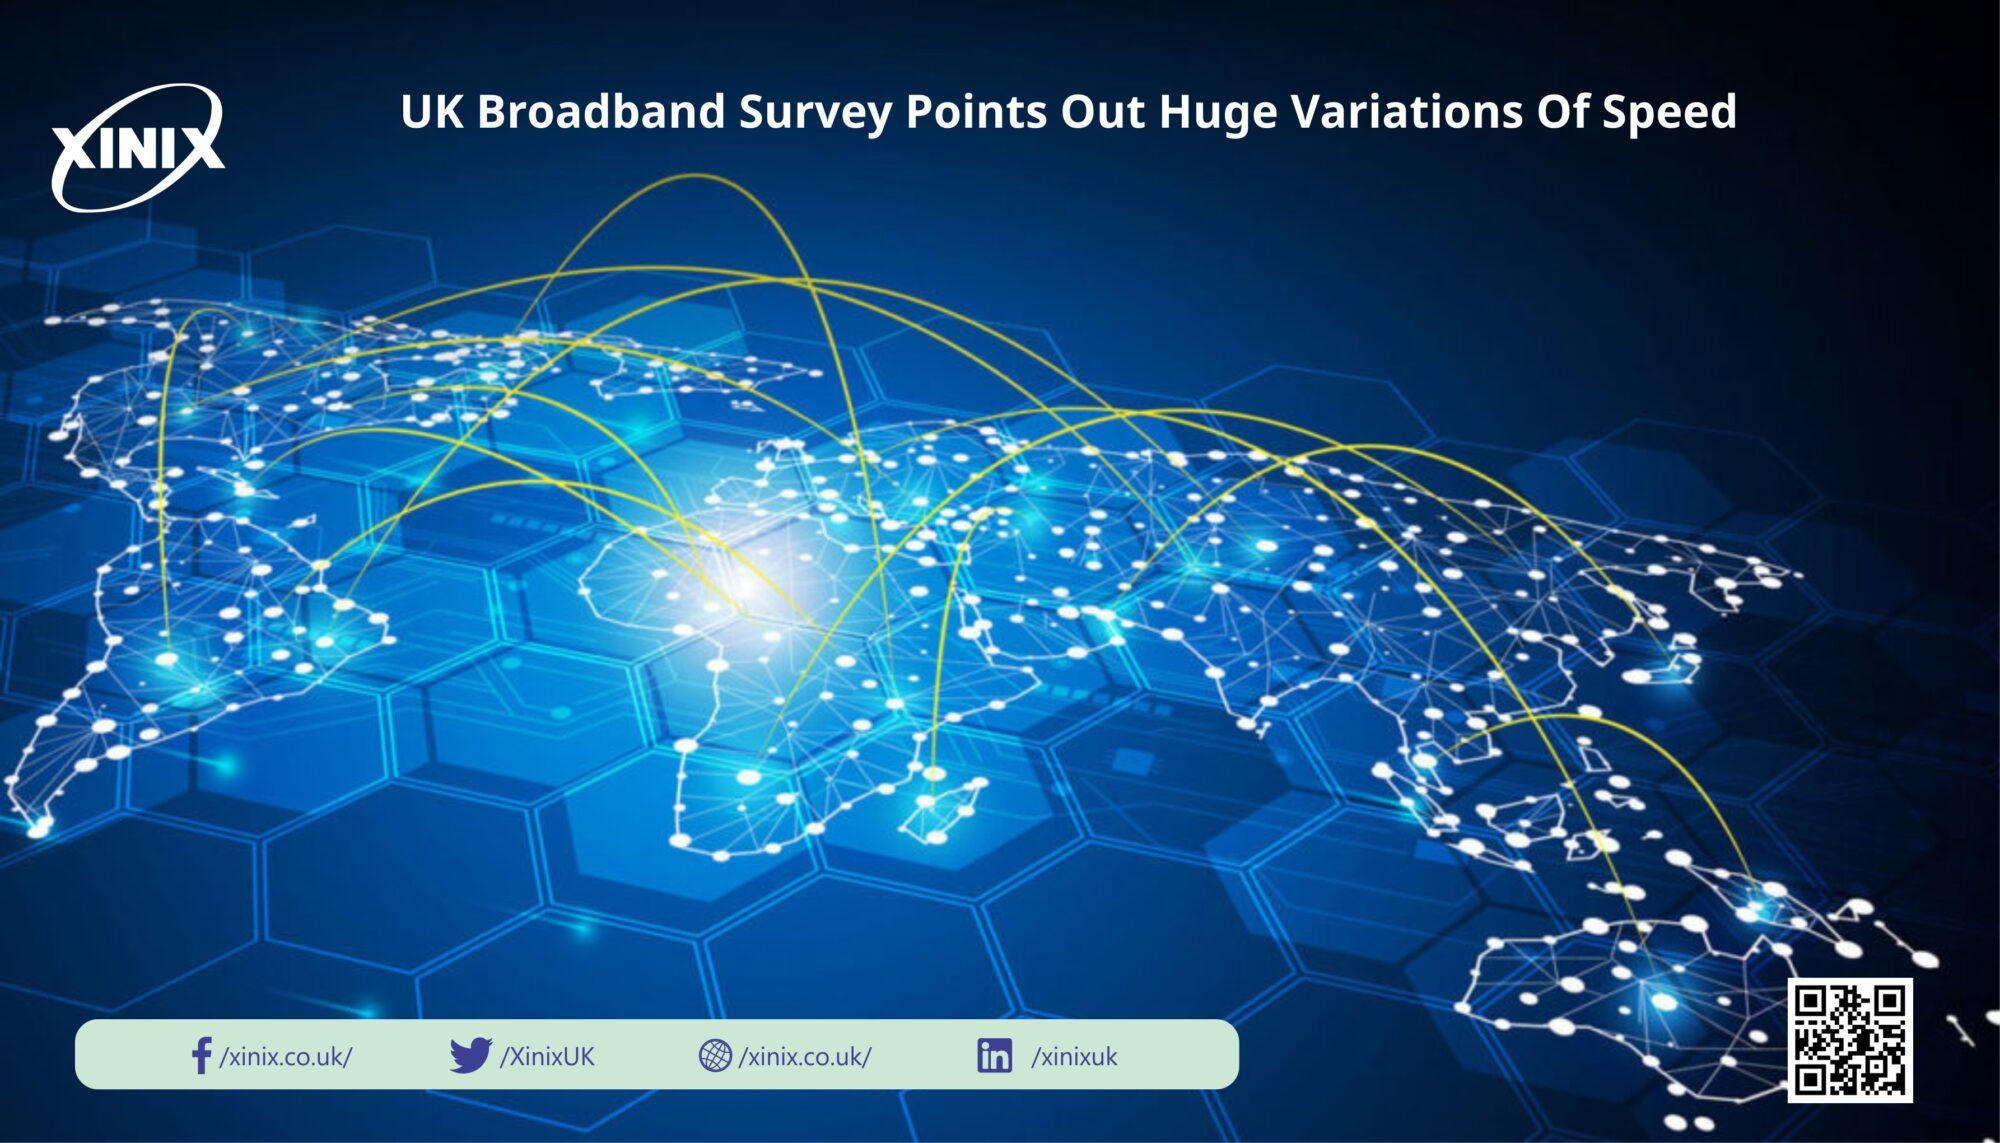 UK Broadband Survey Points Out Huge Variations Of Speed